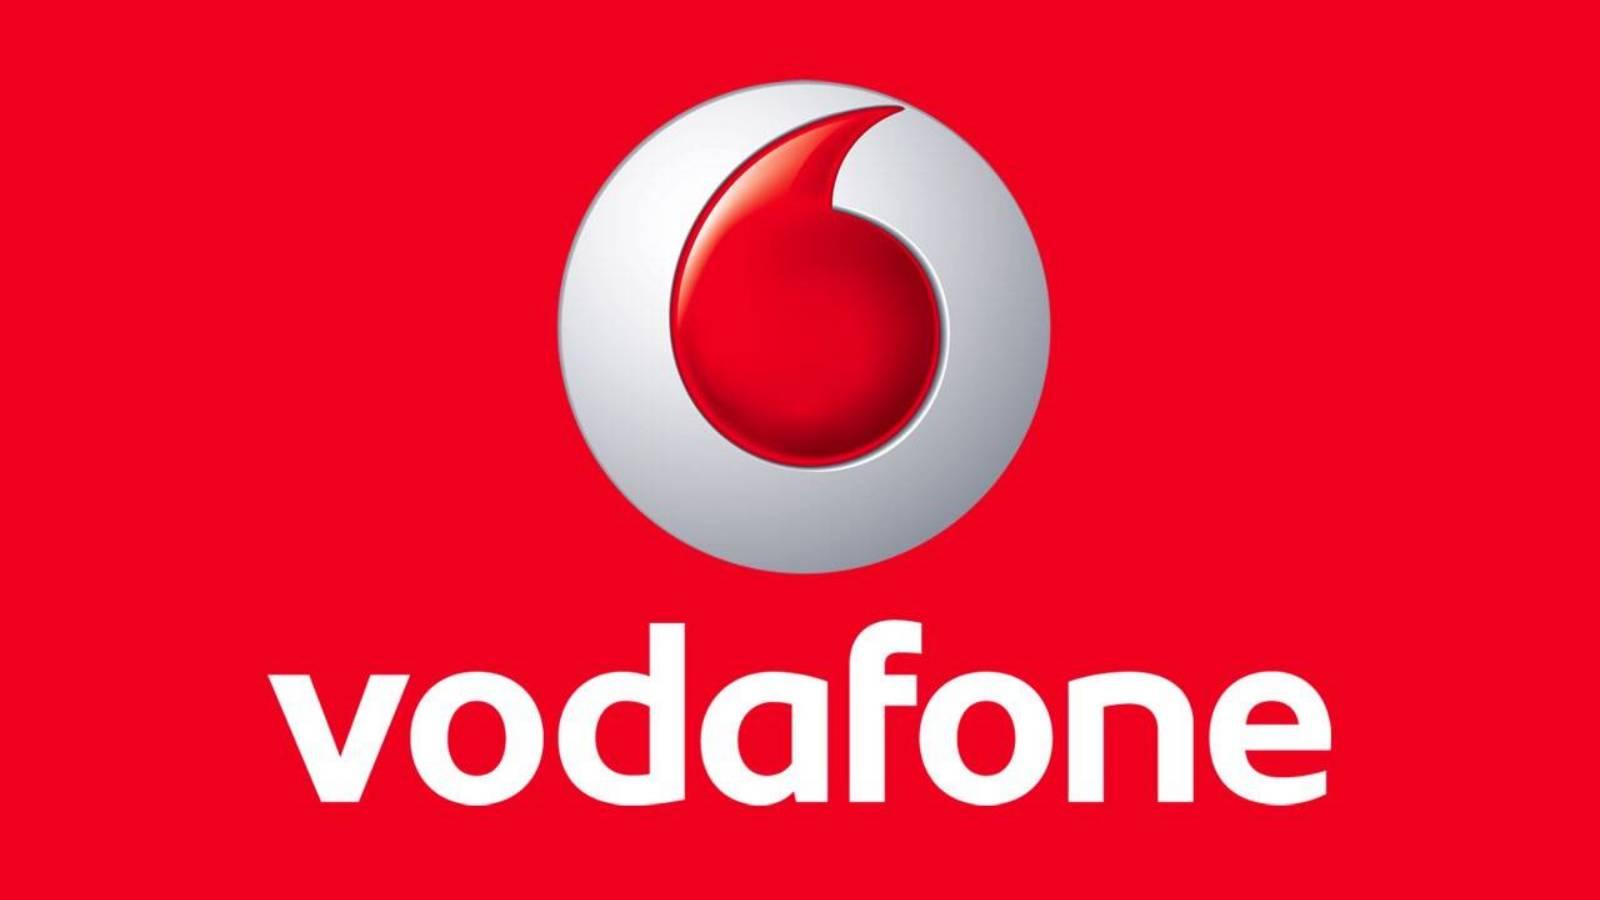 Vodafone sate